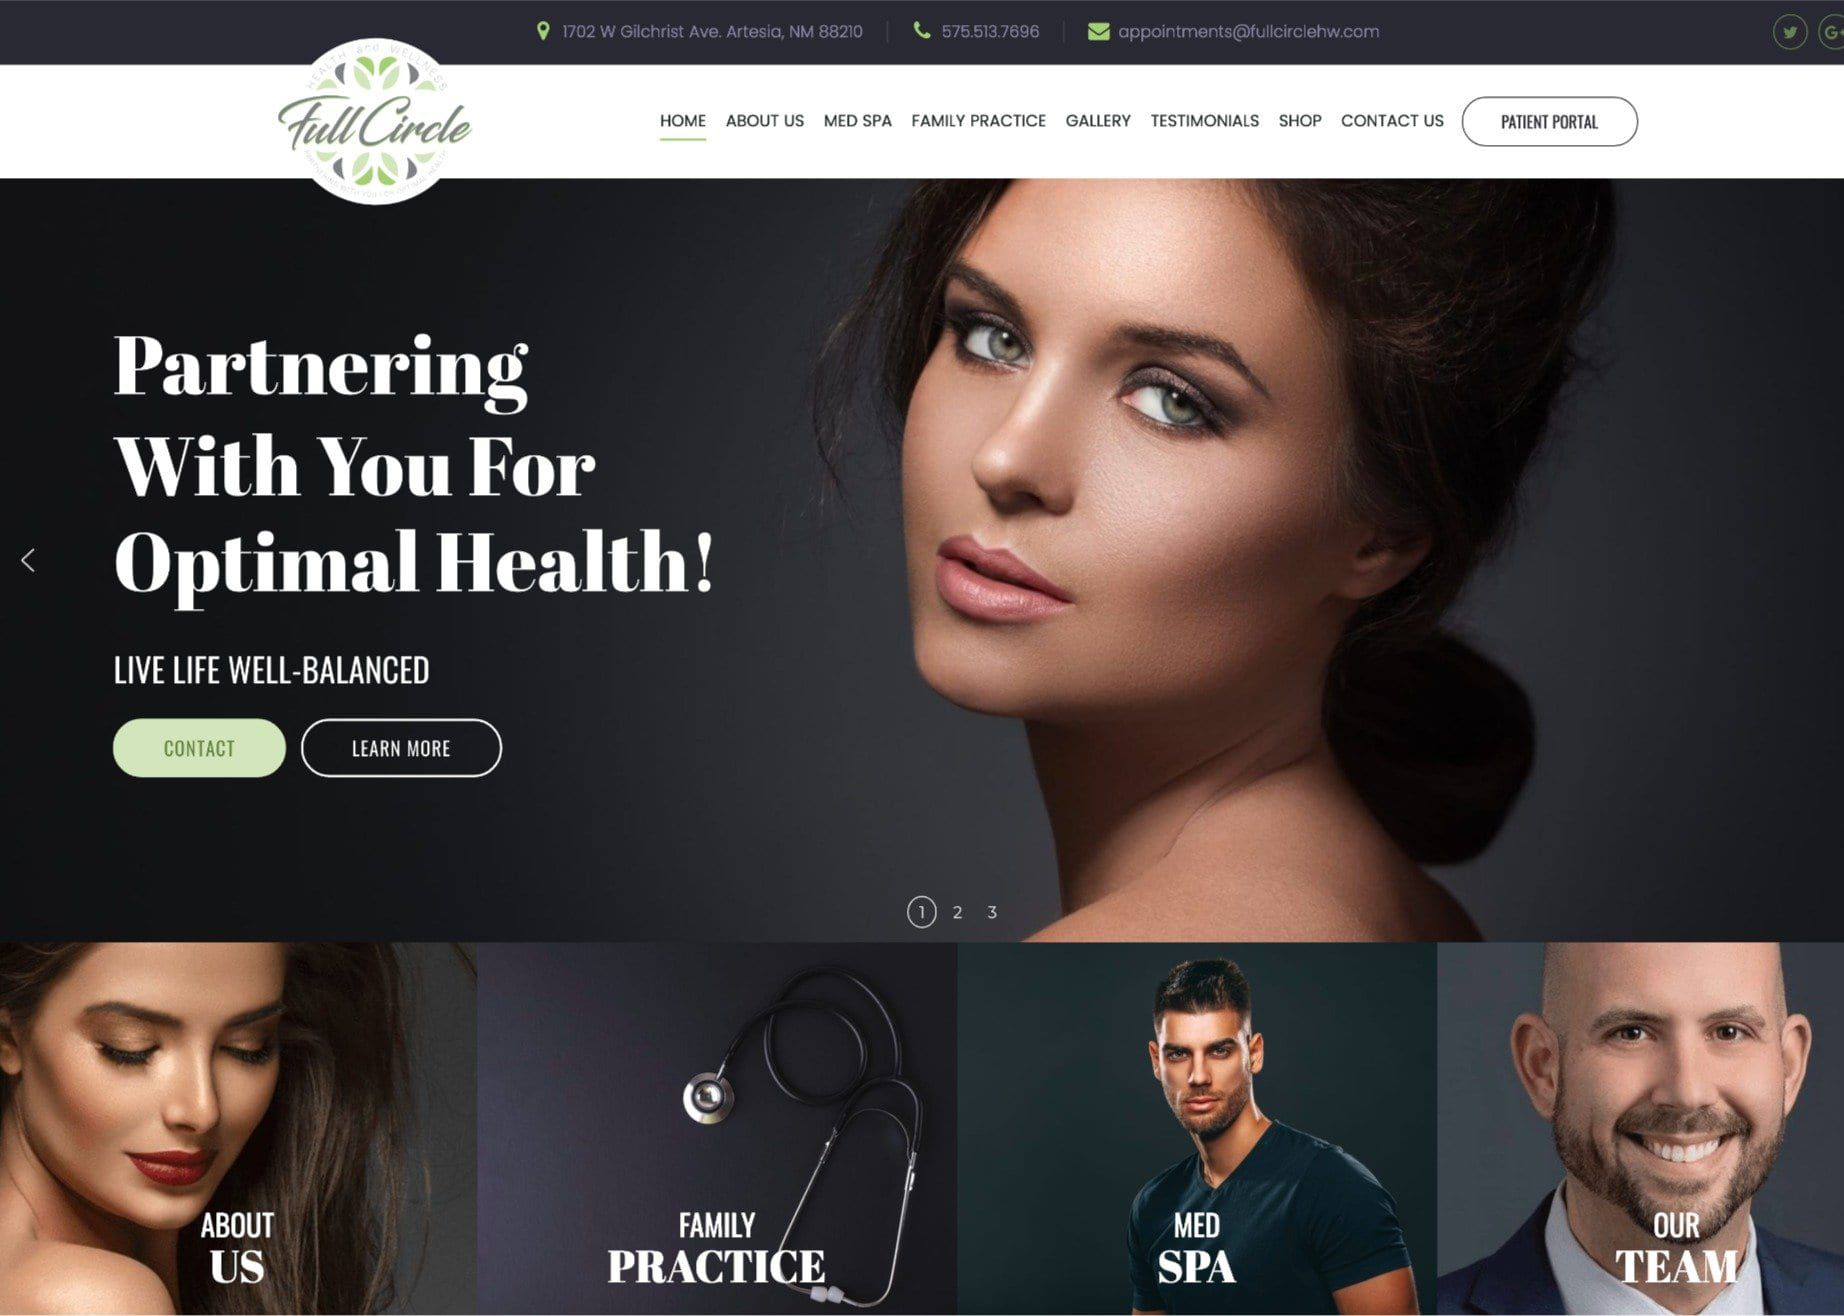 Full Circle Dental Group Website Screenshot